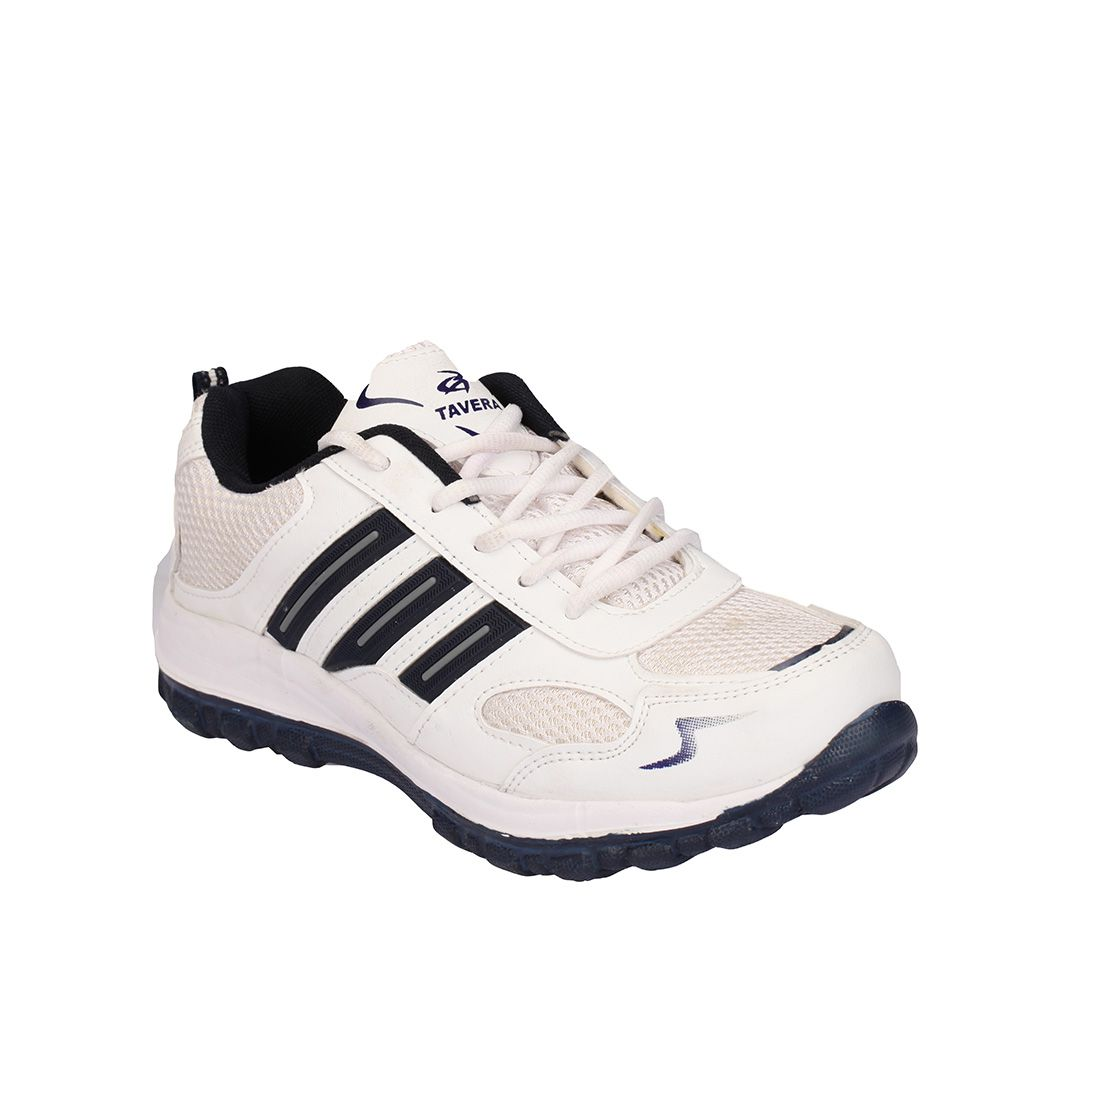 Tavera White Running Shoes - Buy Tavera